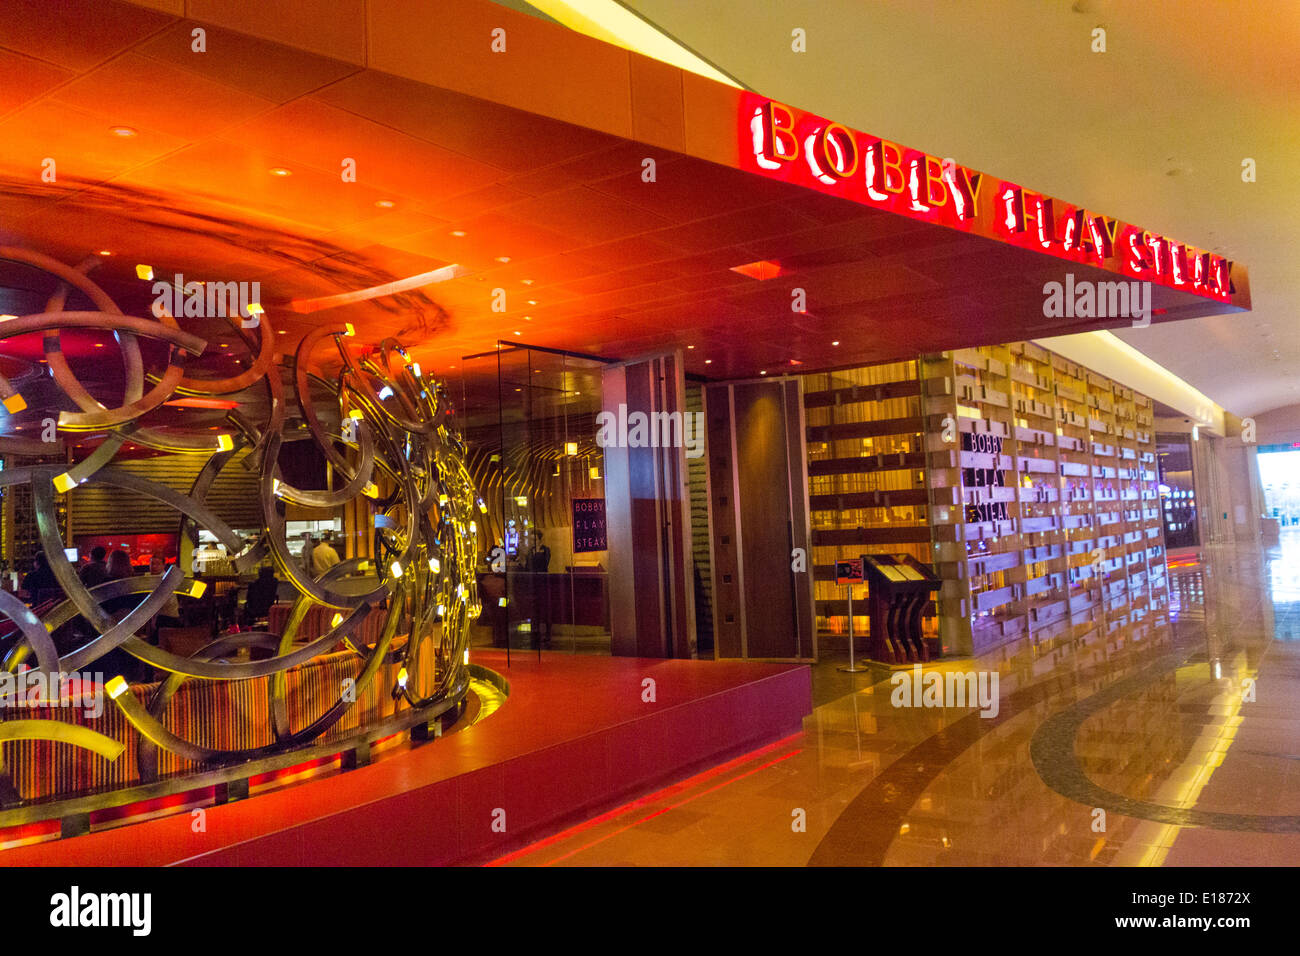 Hotel and casino in atlantic city nj